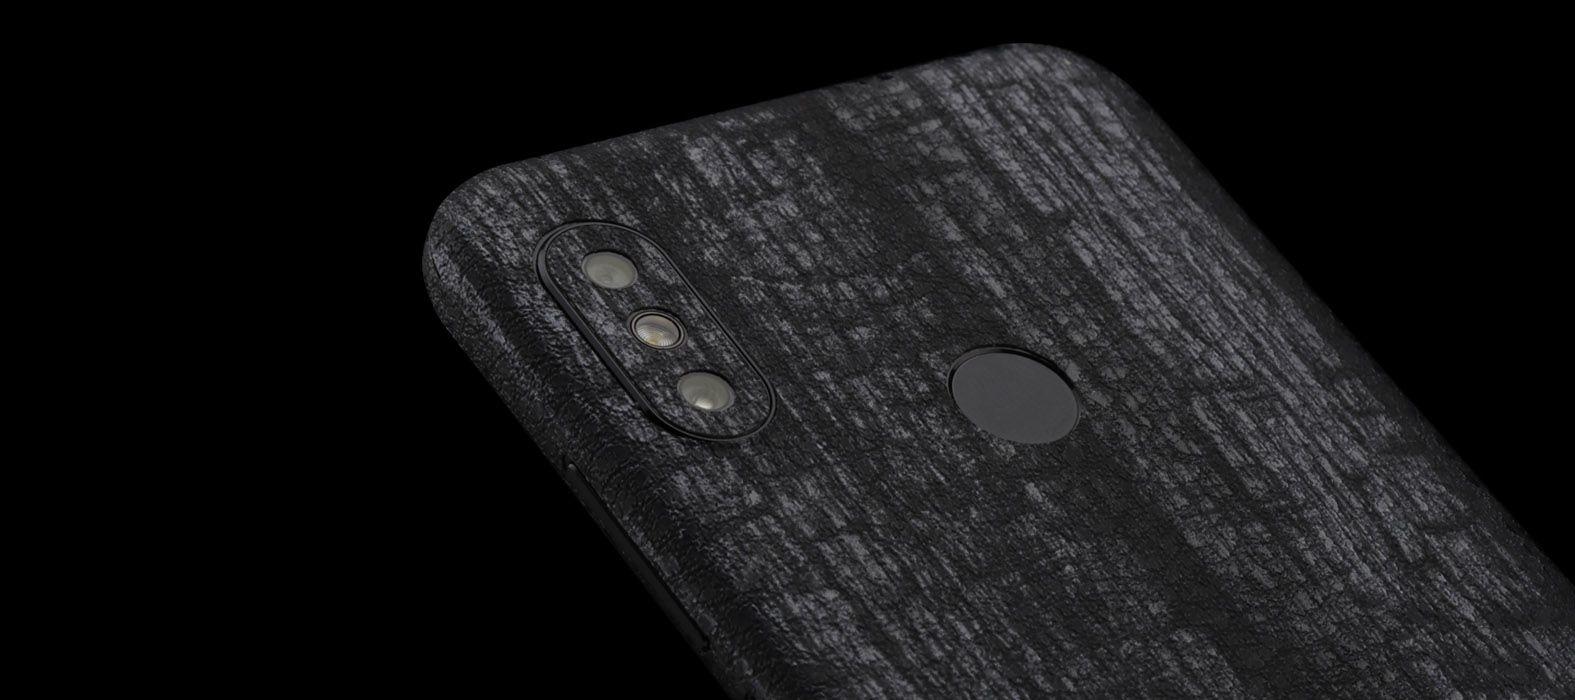 Xiaomi Redmi 6 Pro Black Raptor Skins